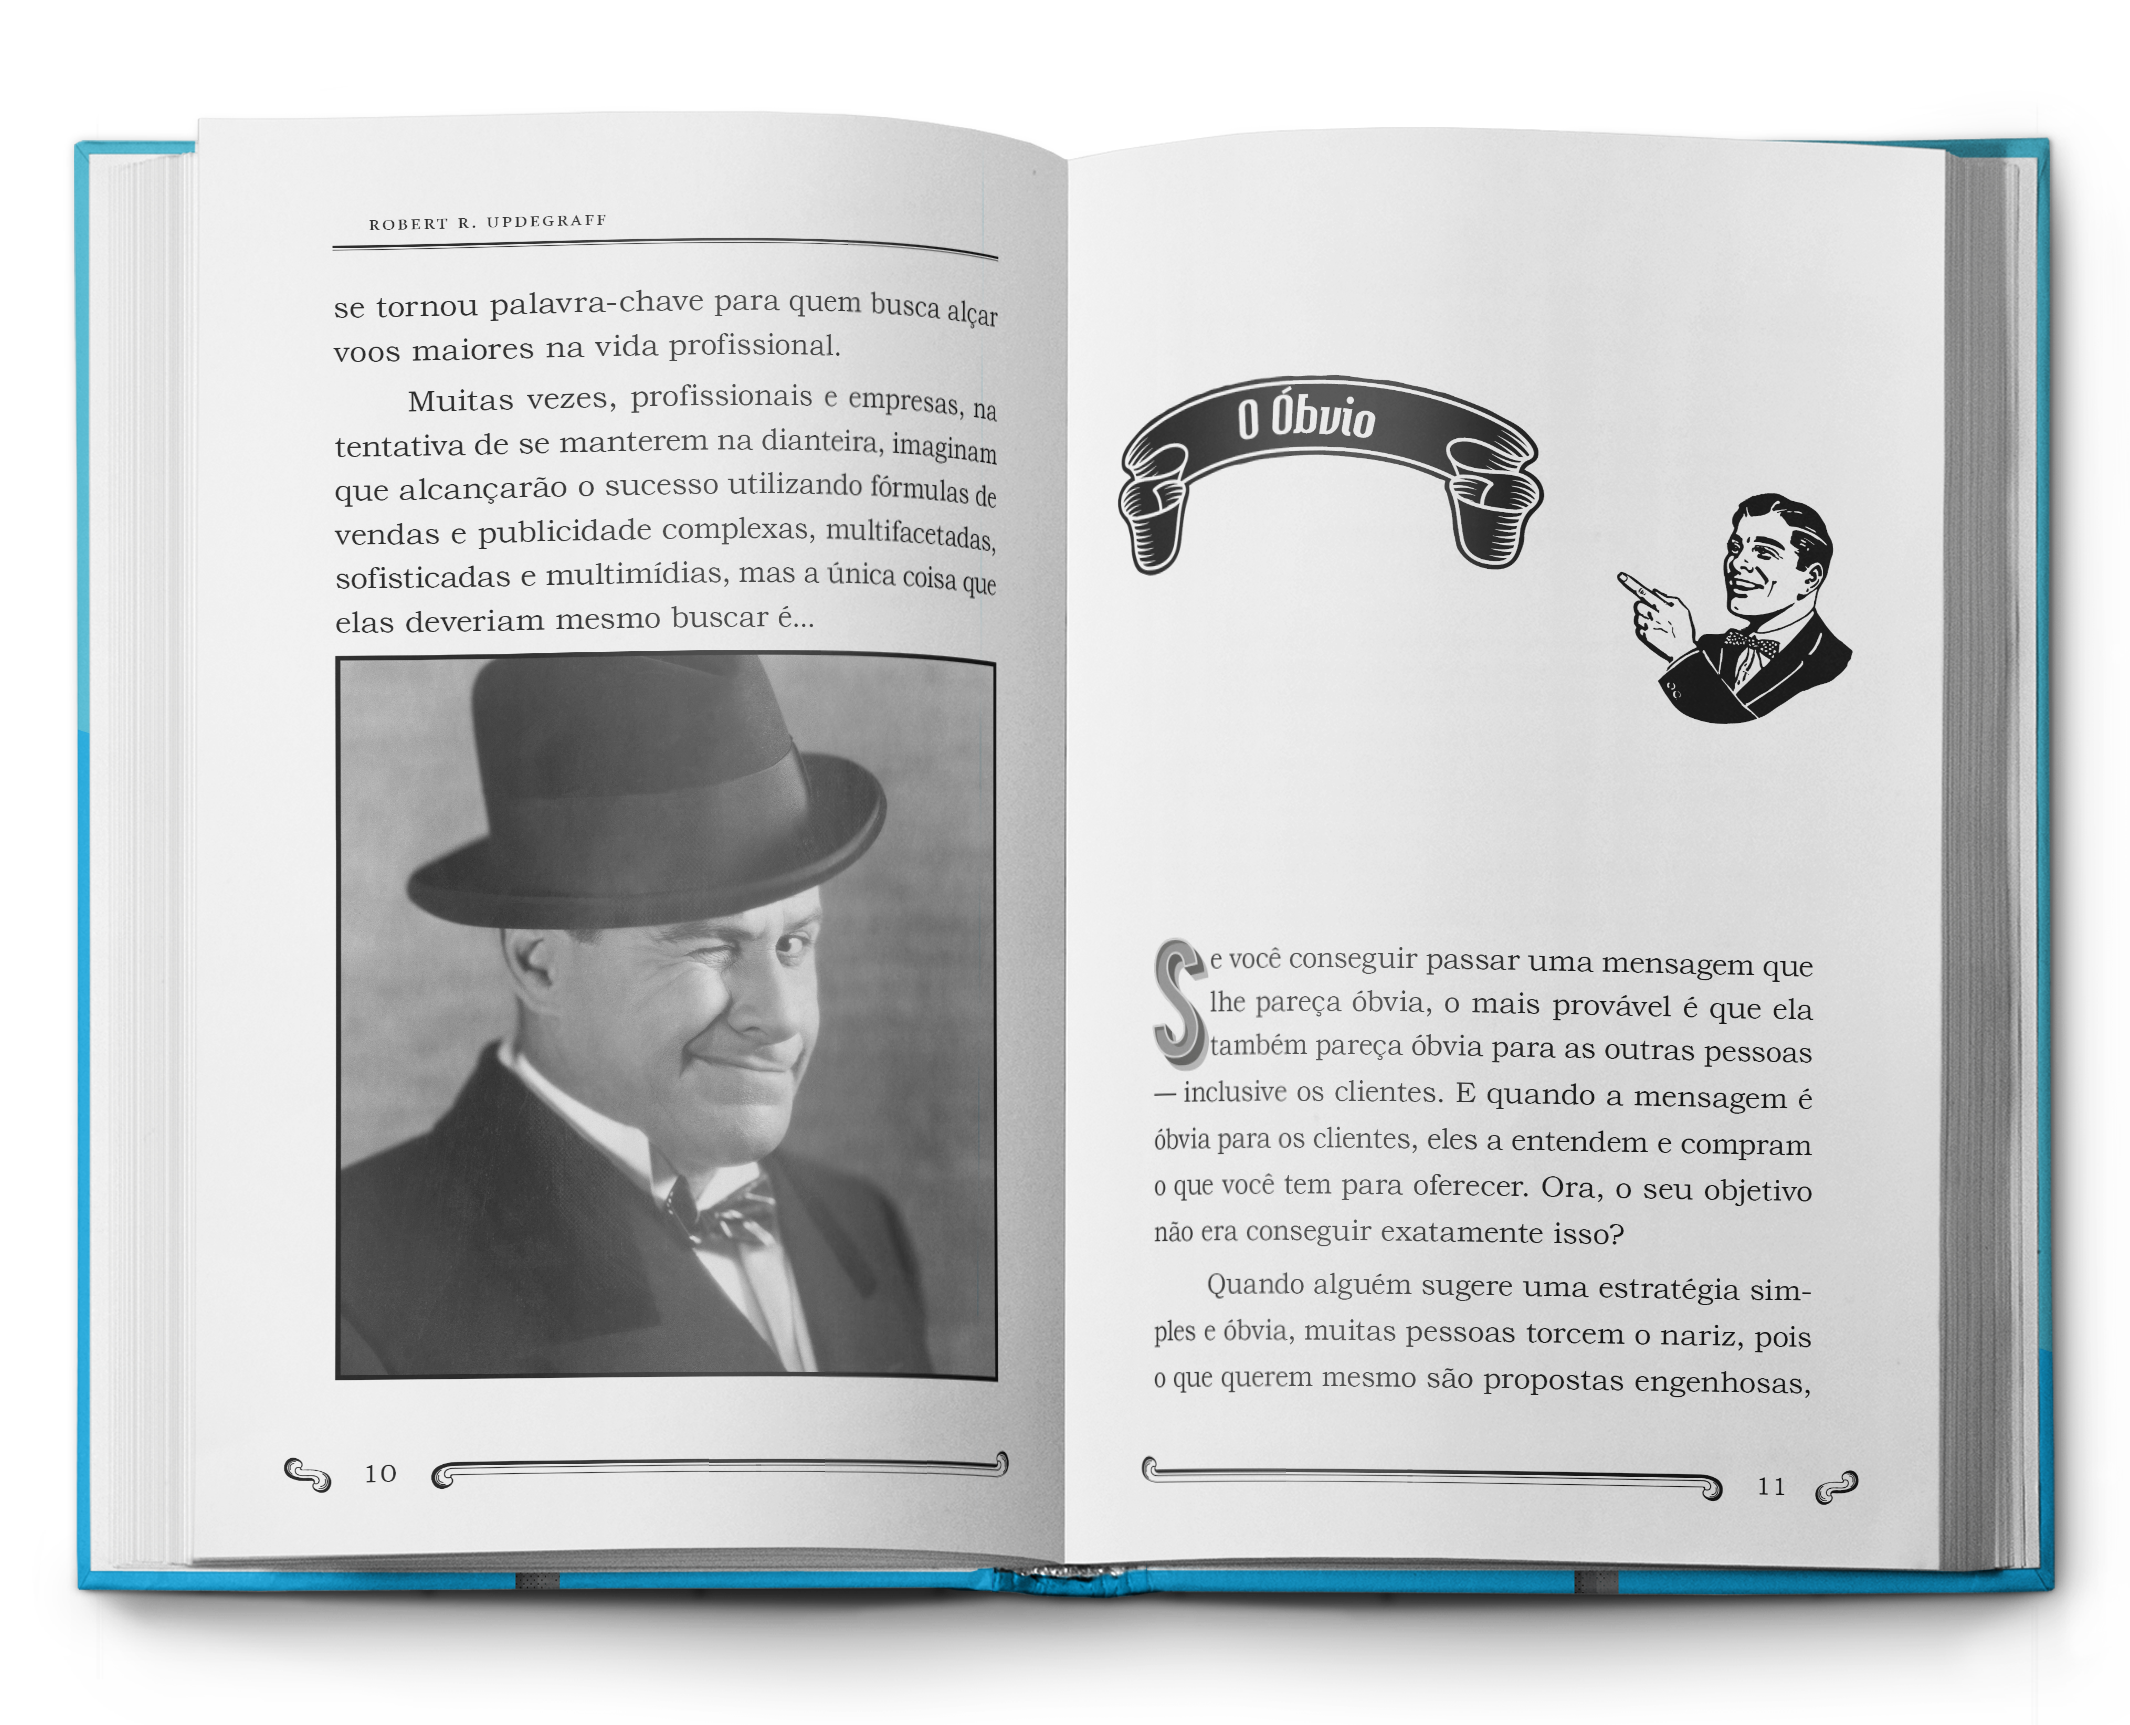 Como obter sucesso incomum na vida profissional - Robert R. Updegraff